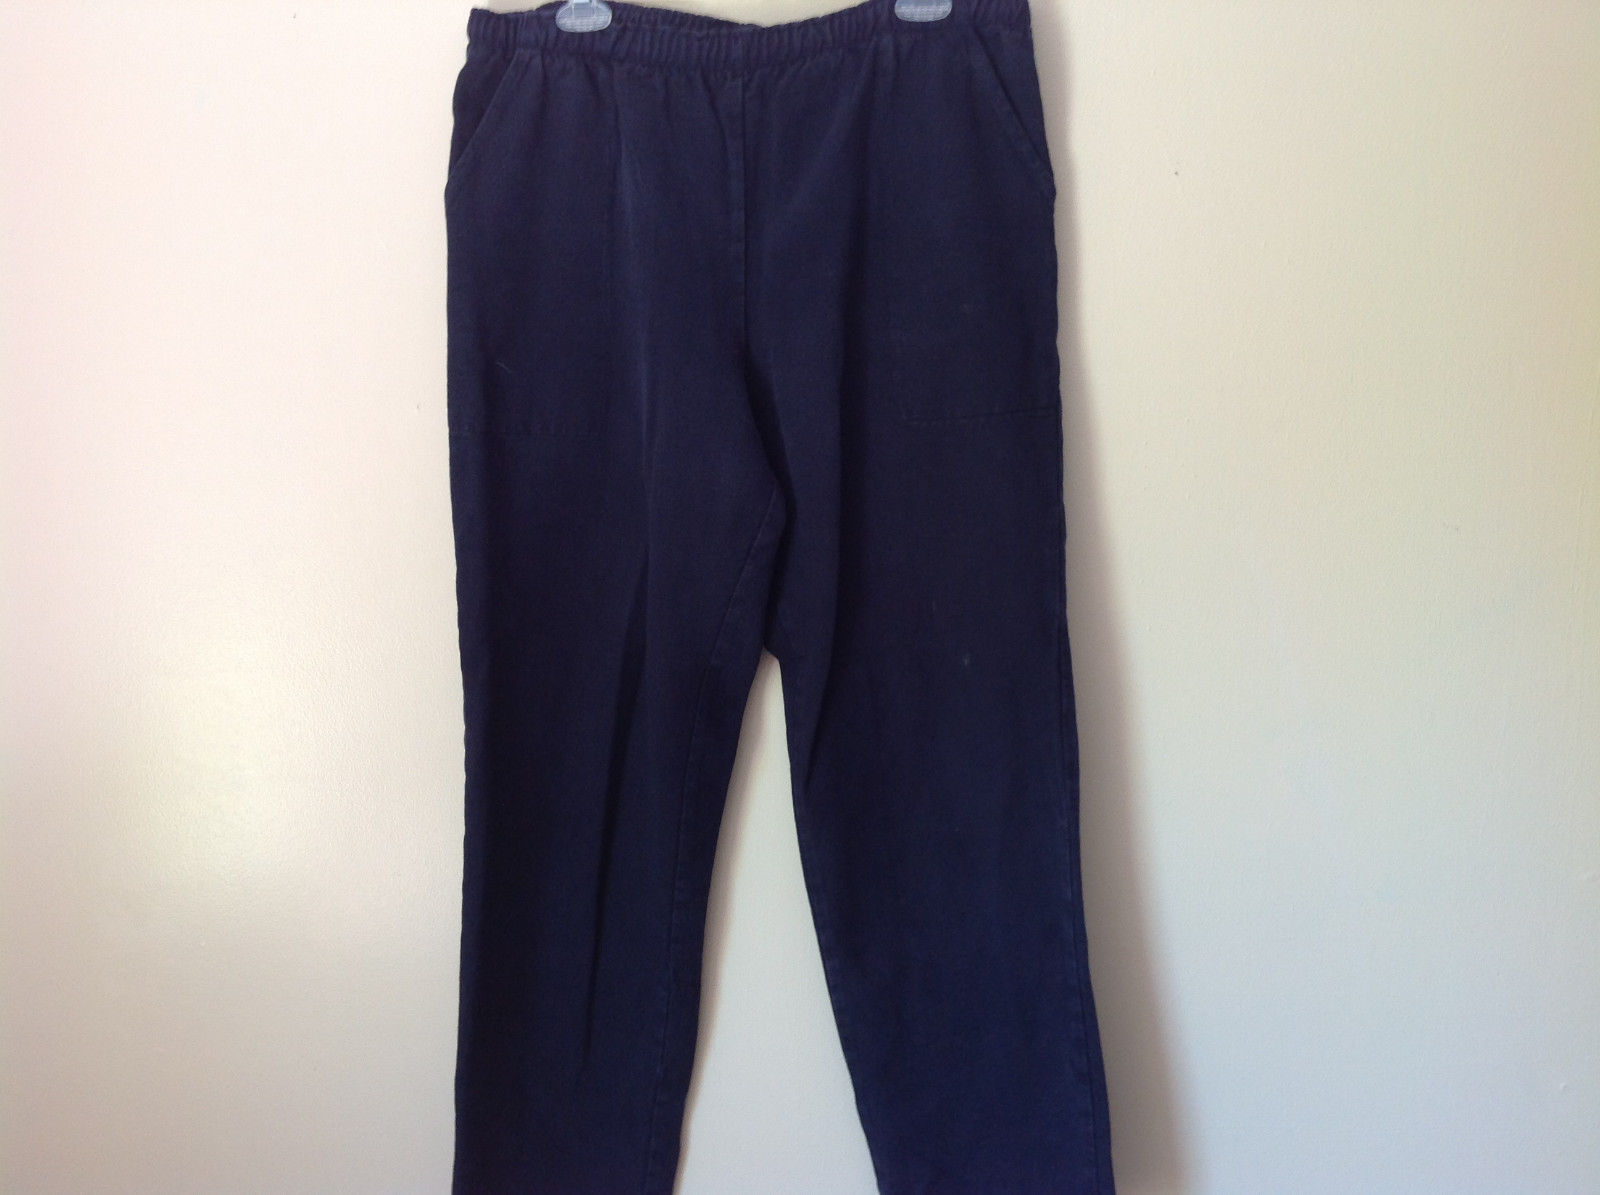 WEK by KellSport Dark Navy Blue Sweat Pants Elastic Stretchy Waistband Size M